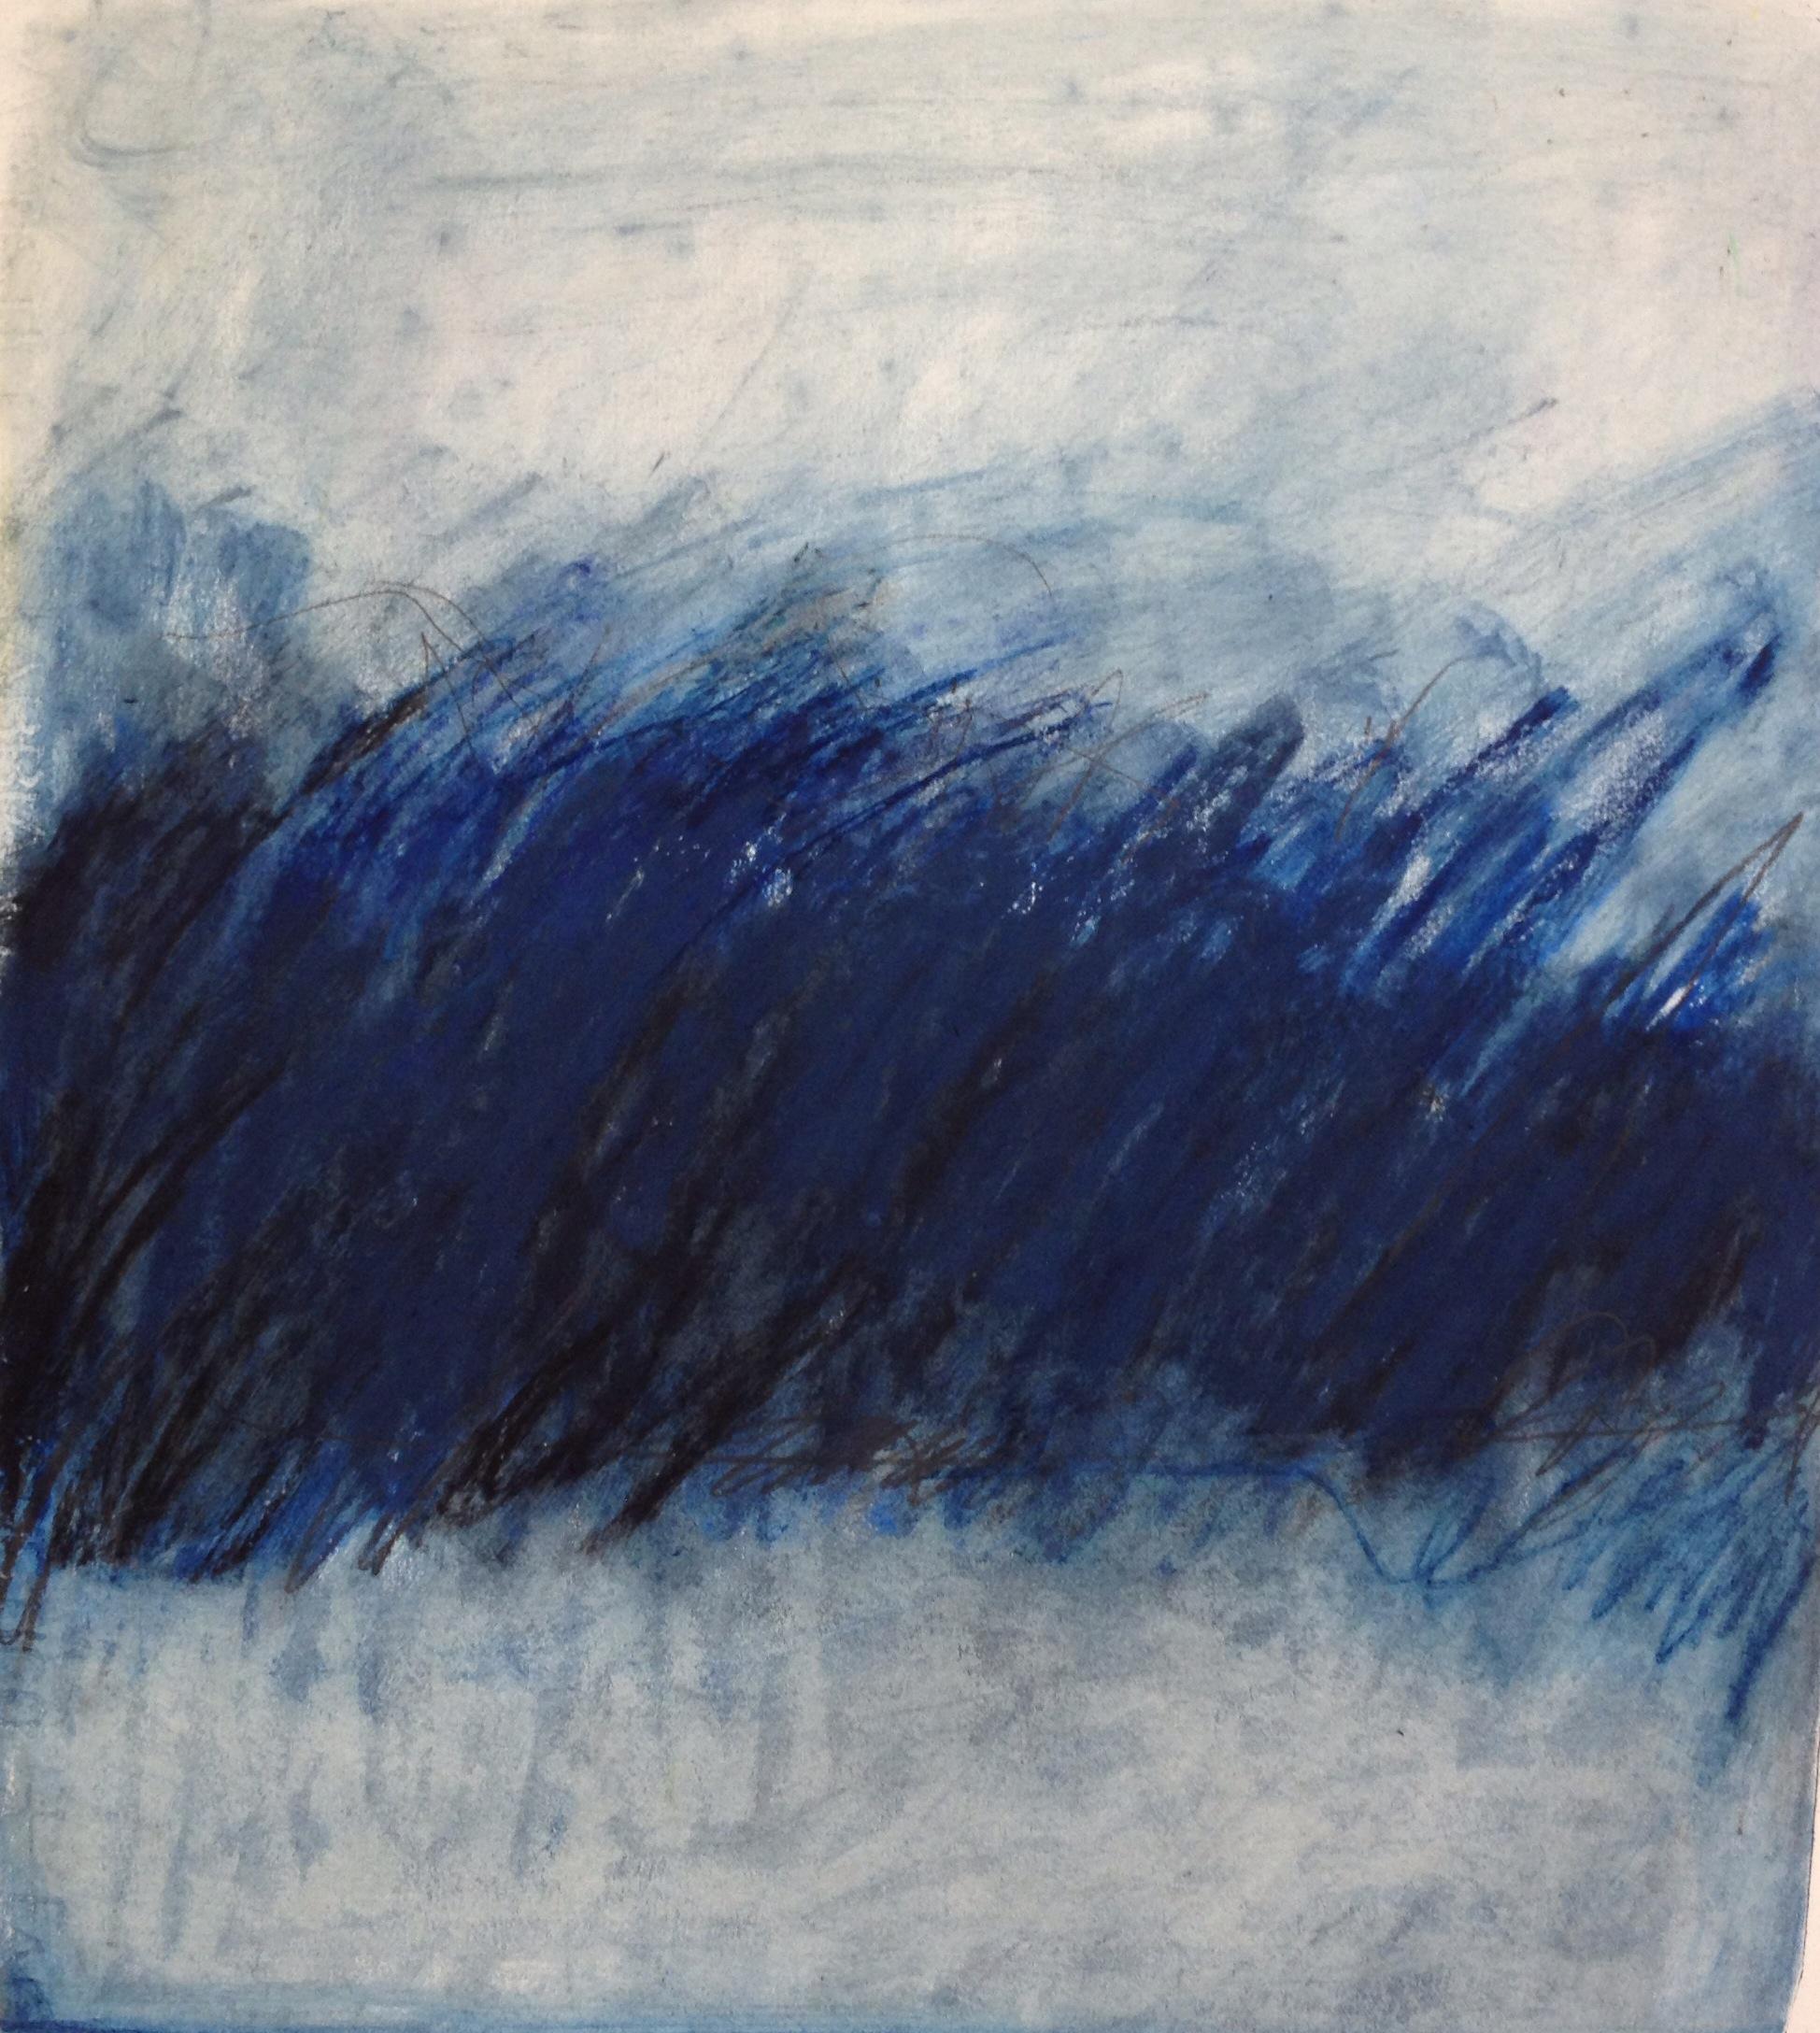 Blue Indigo Field<br/>12x14 Mixed media on paper